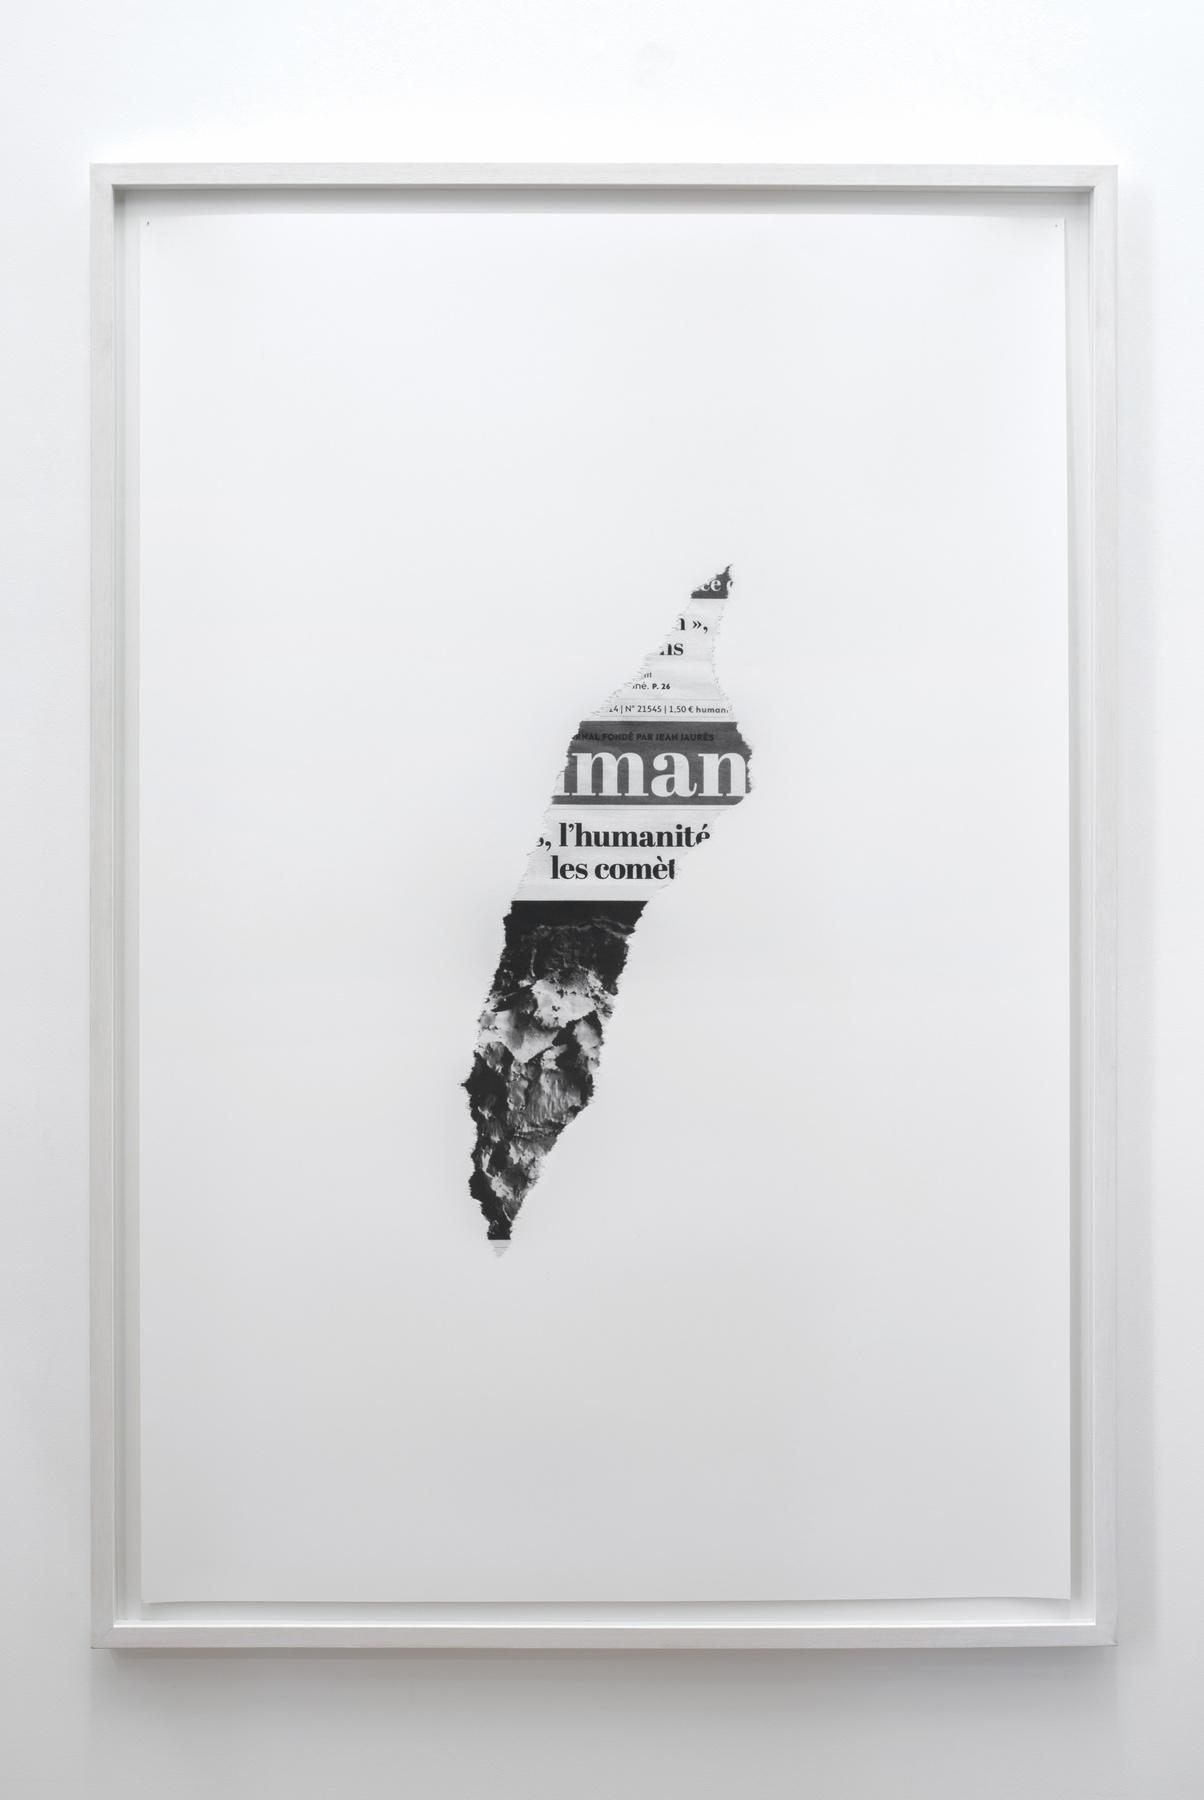 Melik Ohanian, Post-Image — 2013.11.24, 2014, Black and white photograph, 124 x 84 x 3cm (framed), 1_3